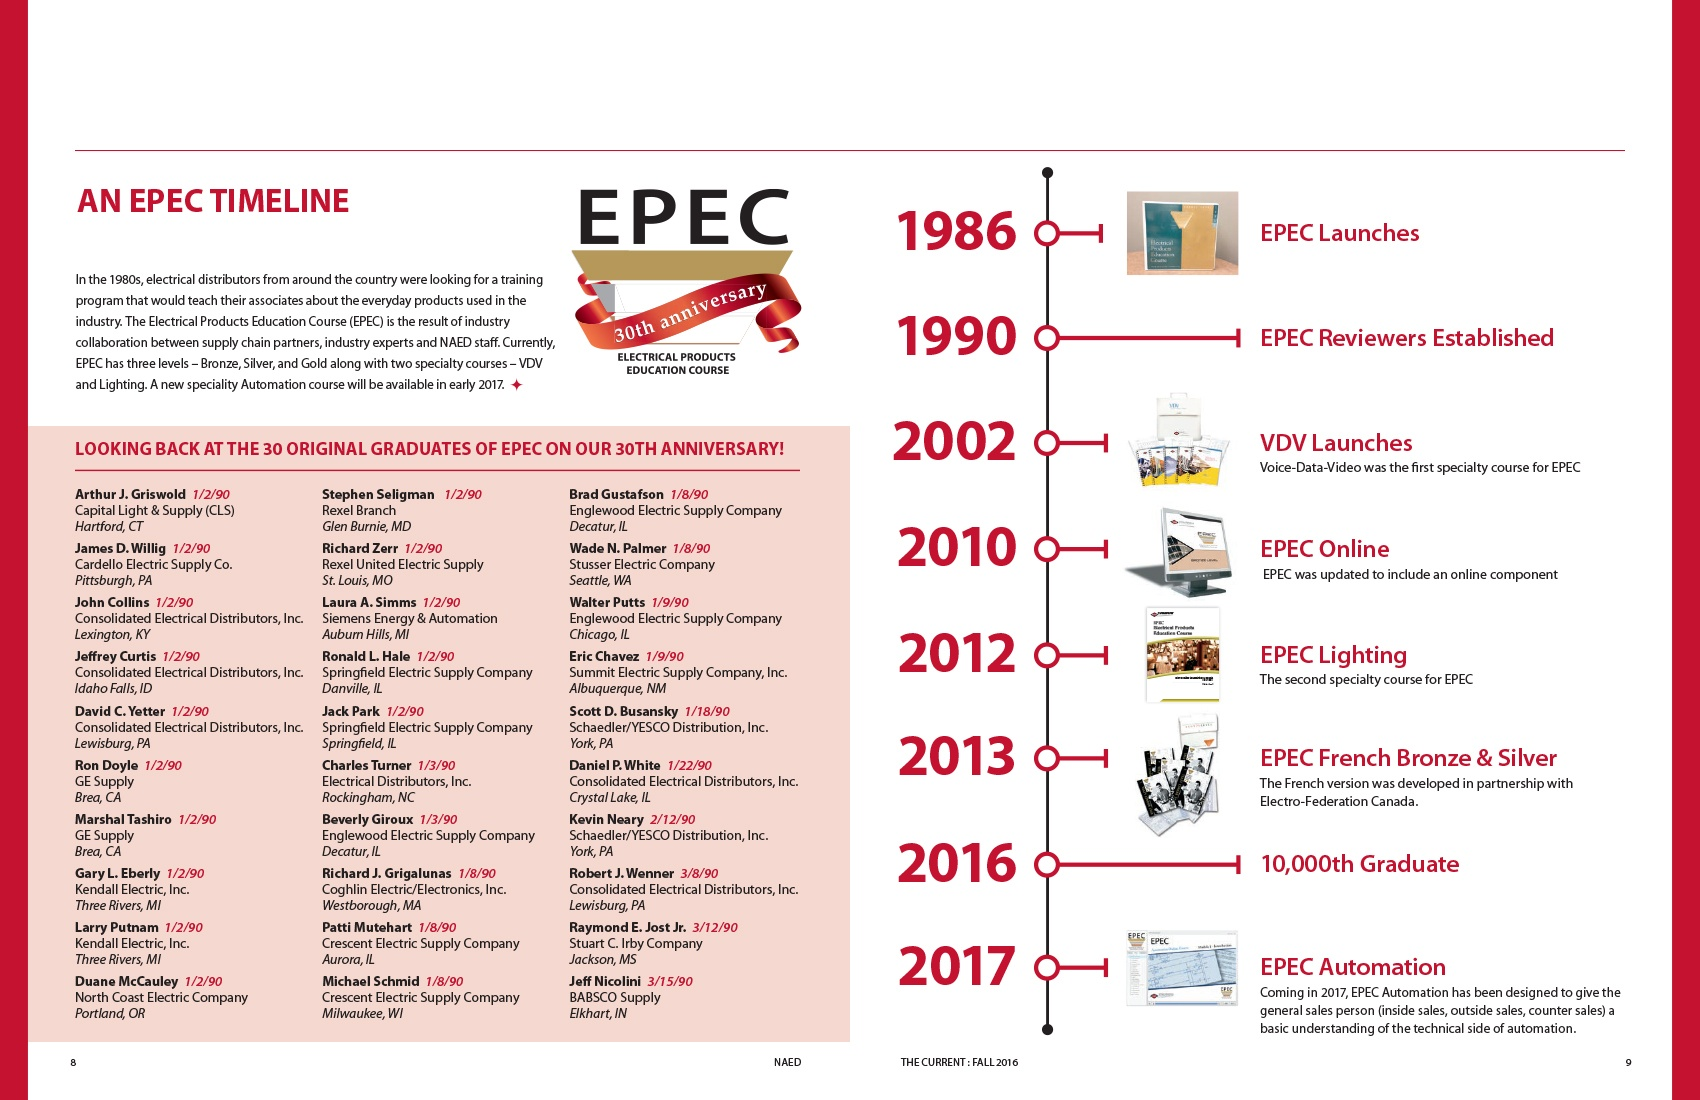 EPEC-Timeline.jpg